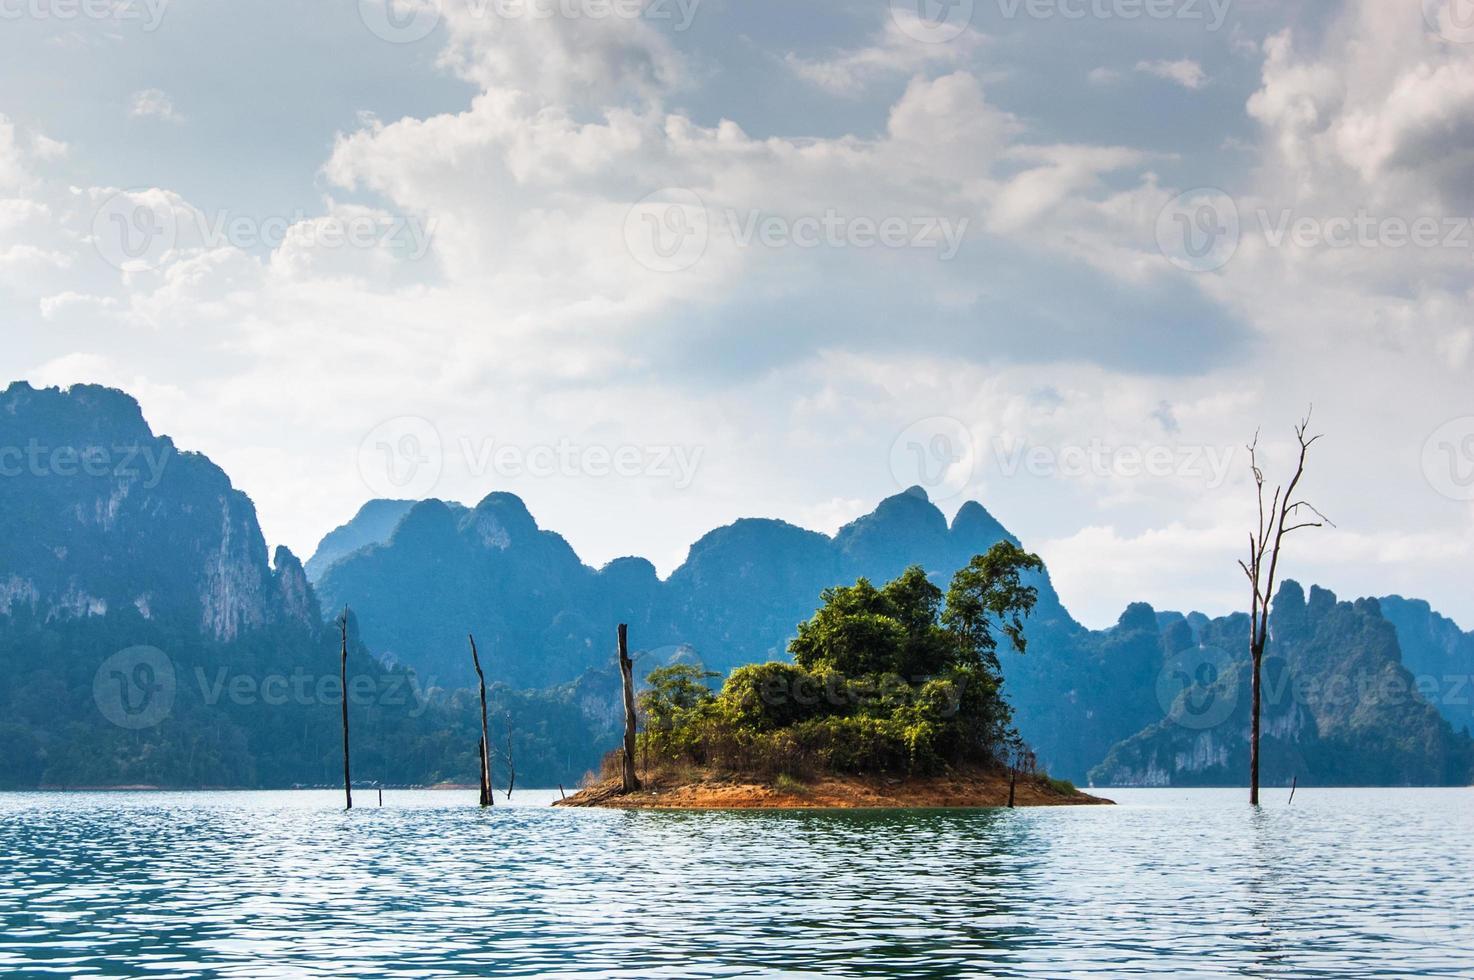 pequena ilha, parque nacional khao sok foto